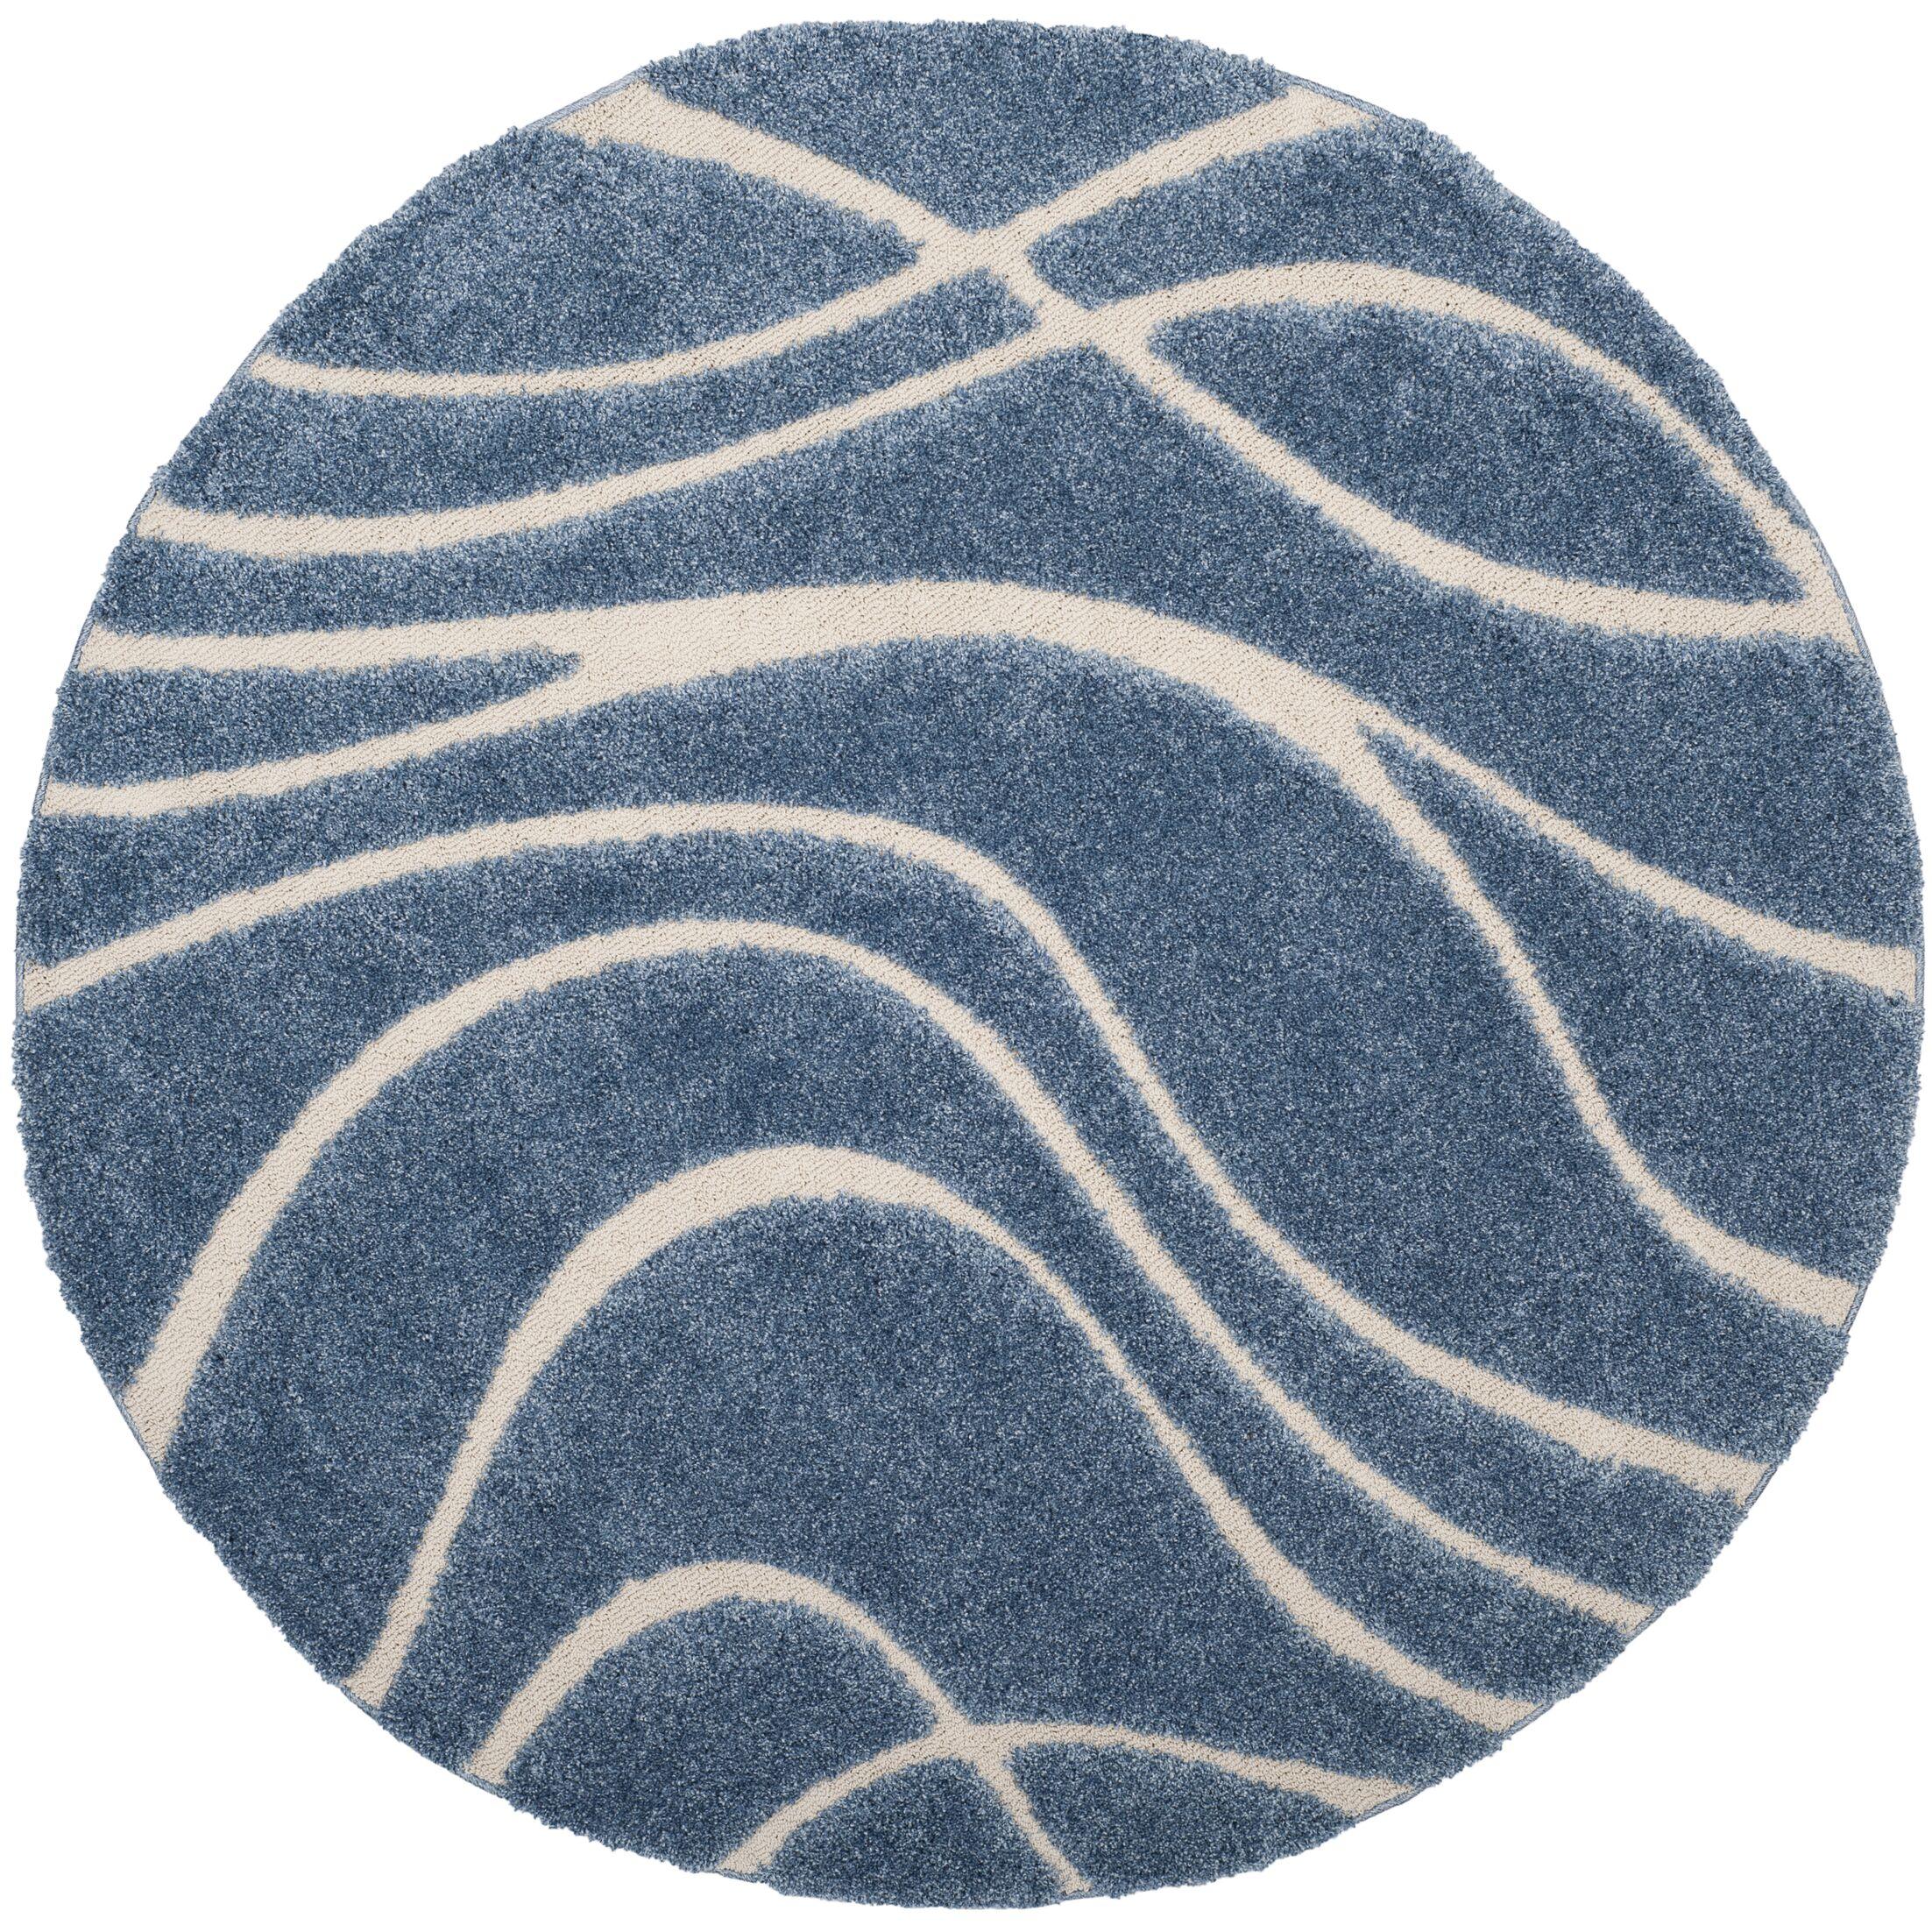 Enrique Blue/Cream Area Rug Rug Size: Round 6'7